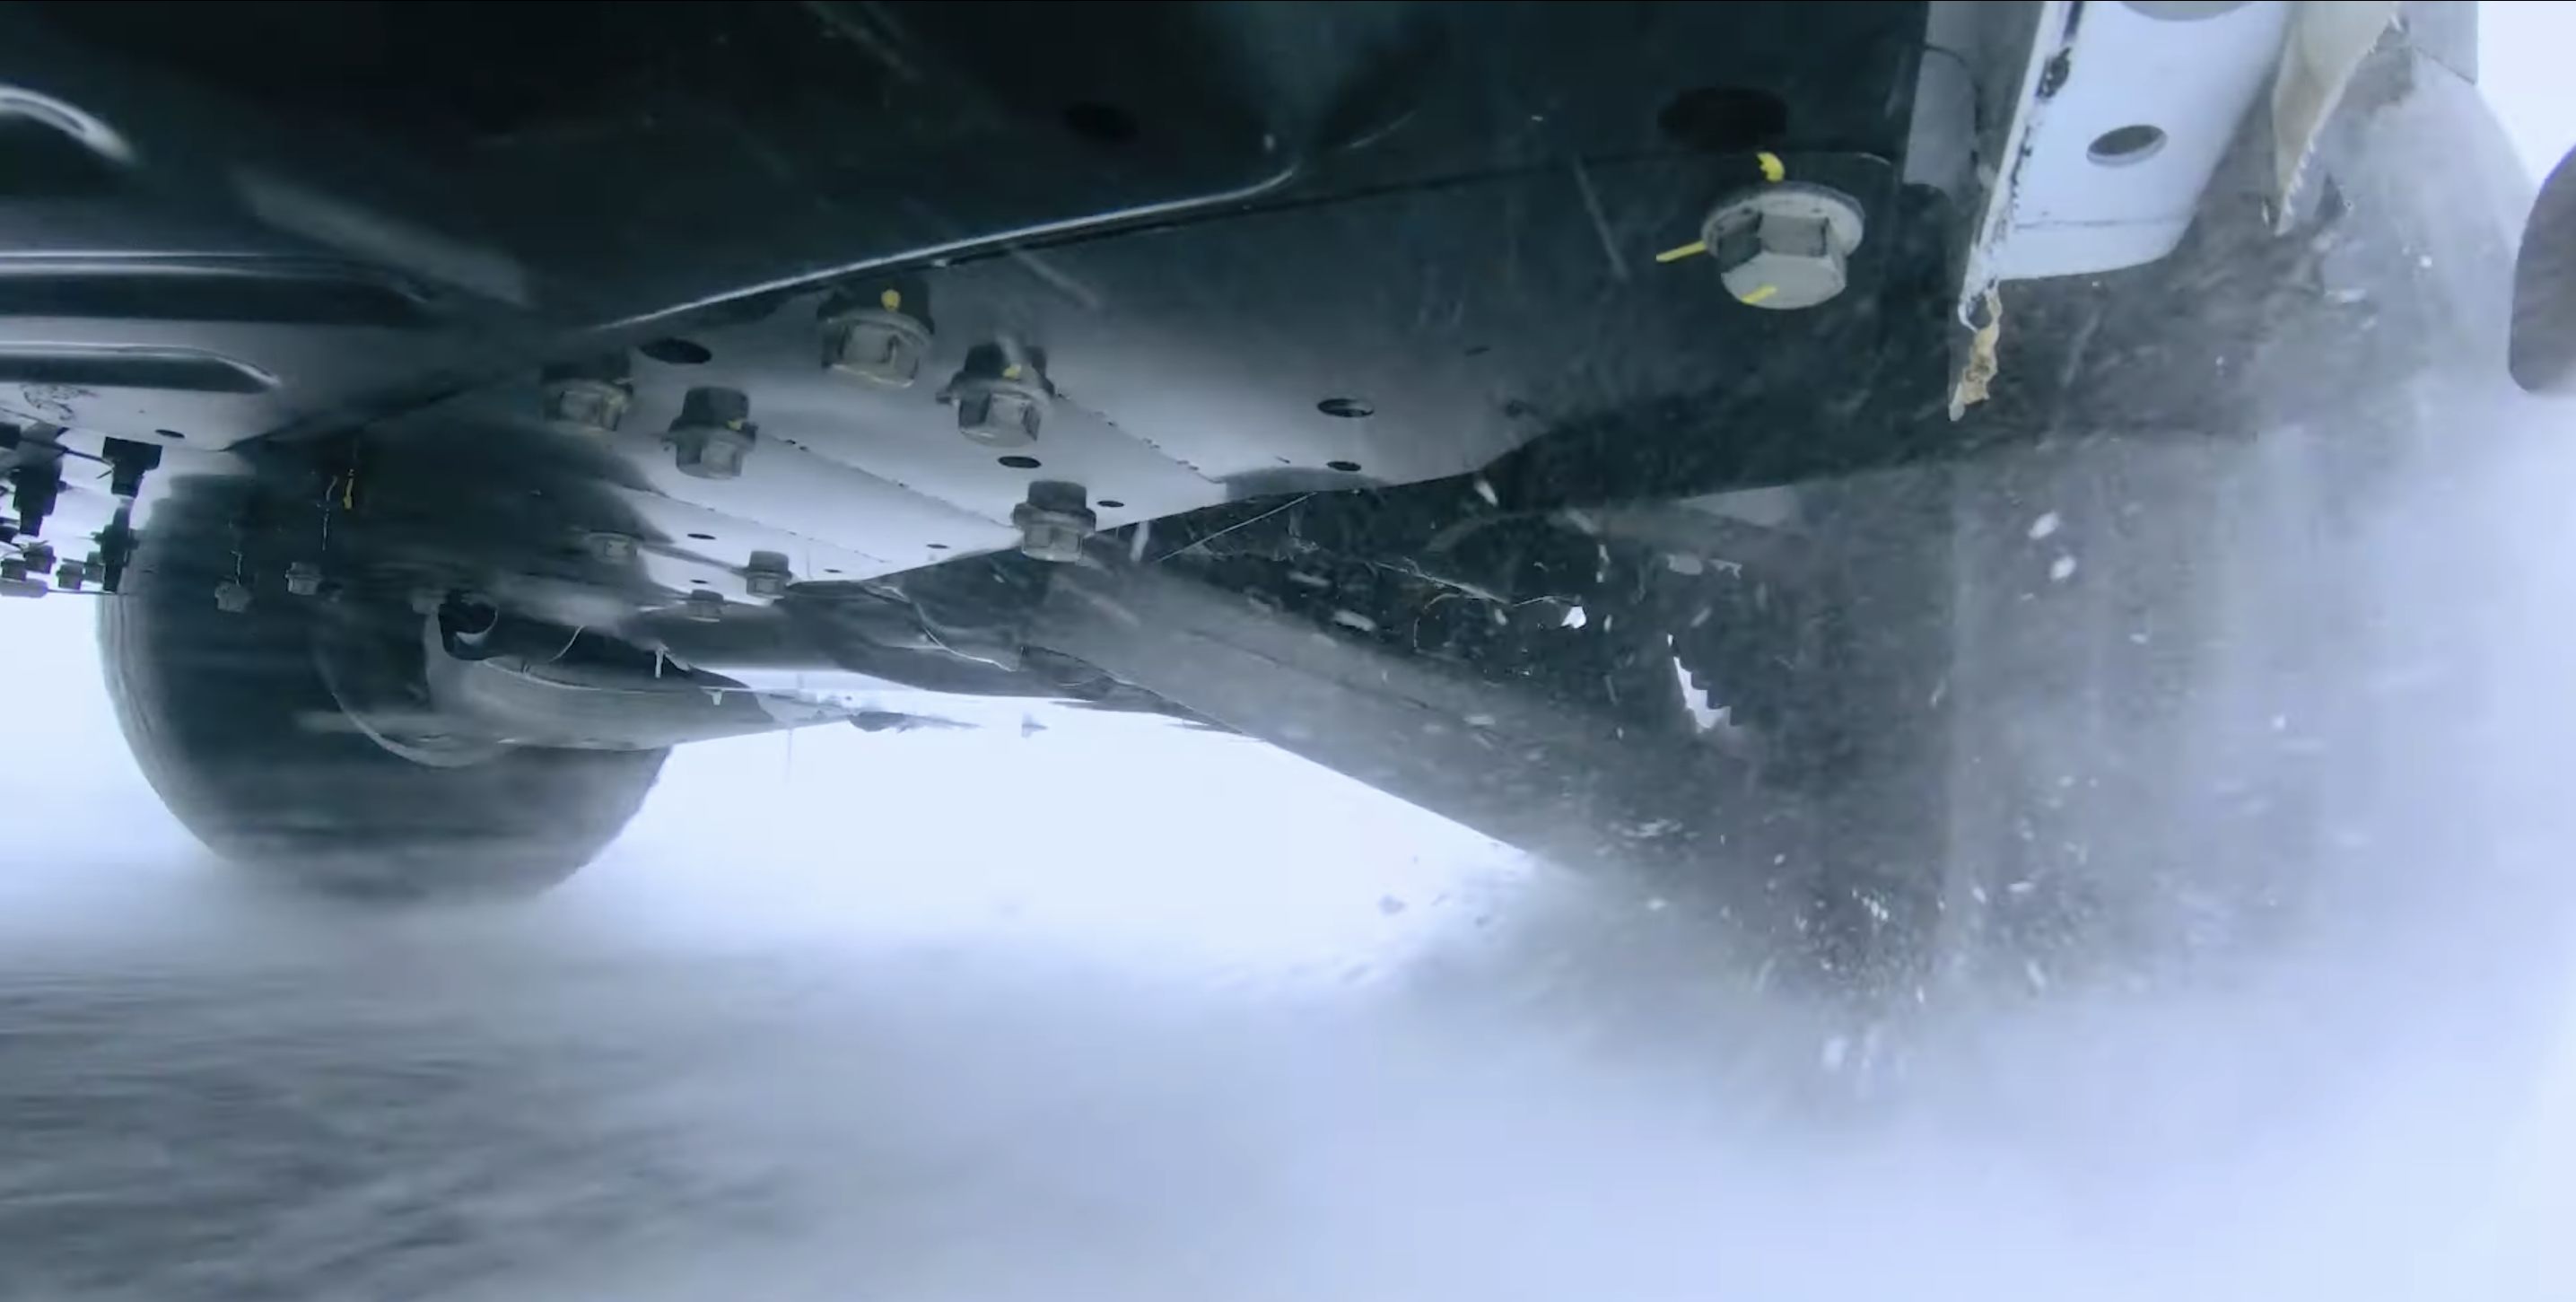 Hummer EV pickup winter testing underbody suspension